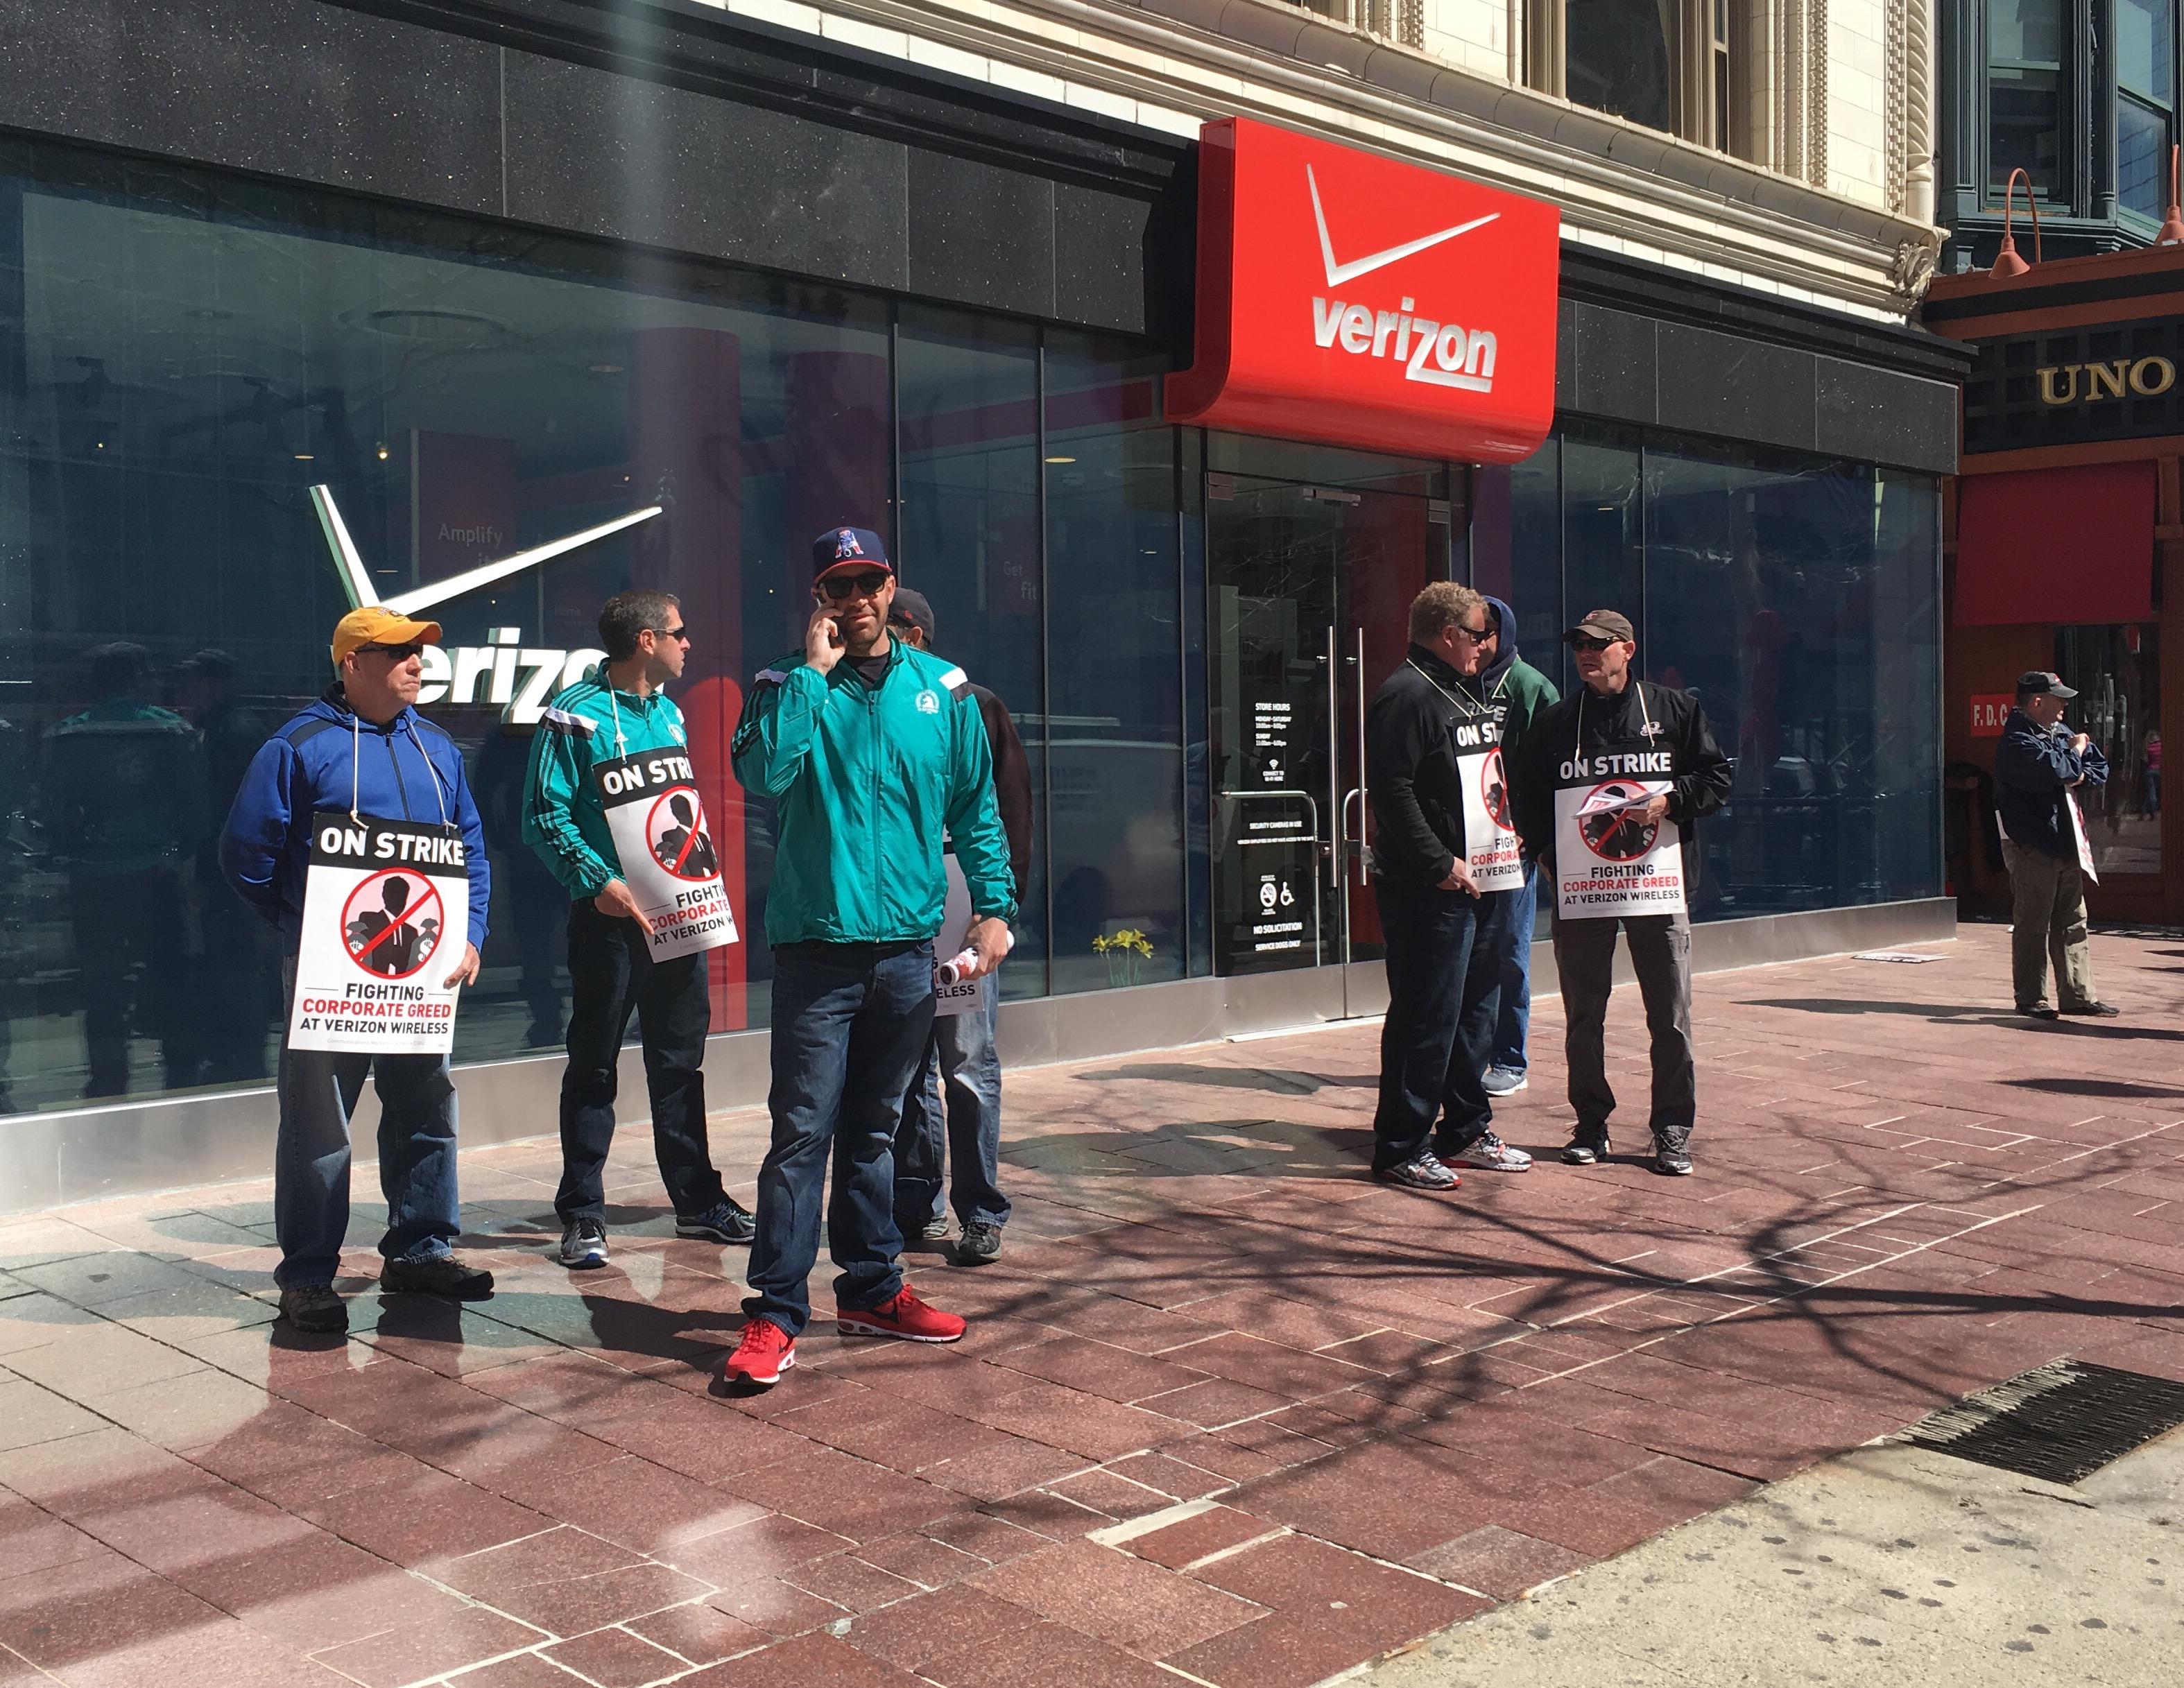 Striking Verizon workers on a picket line